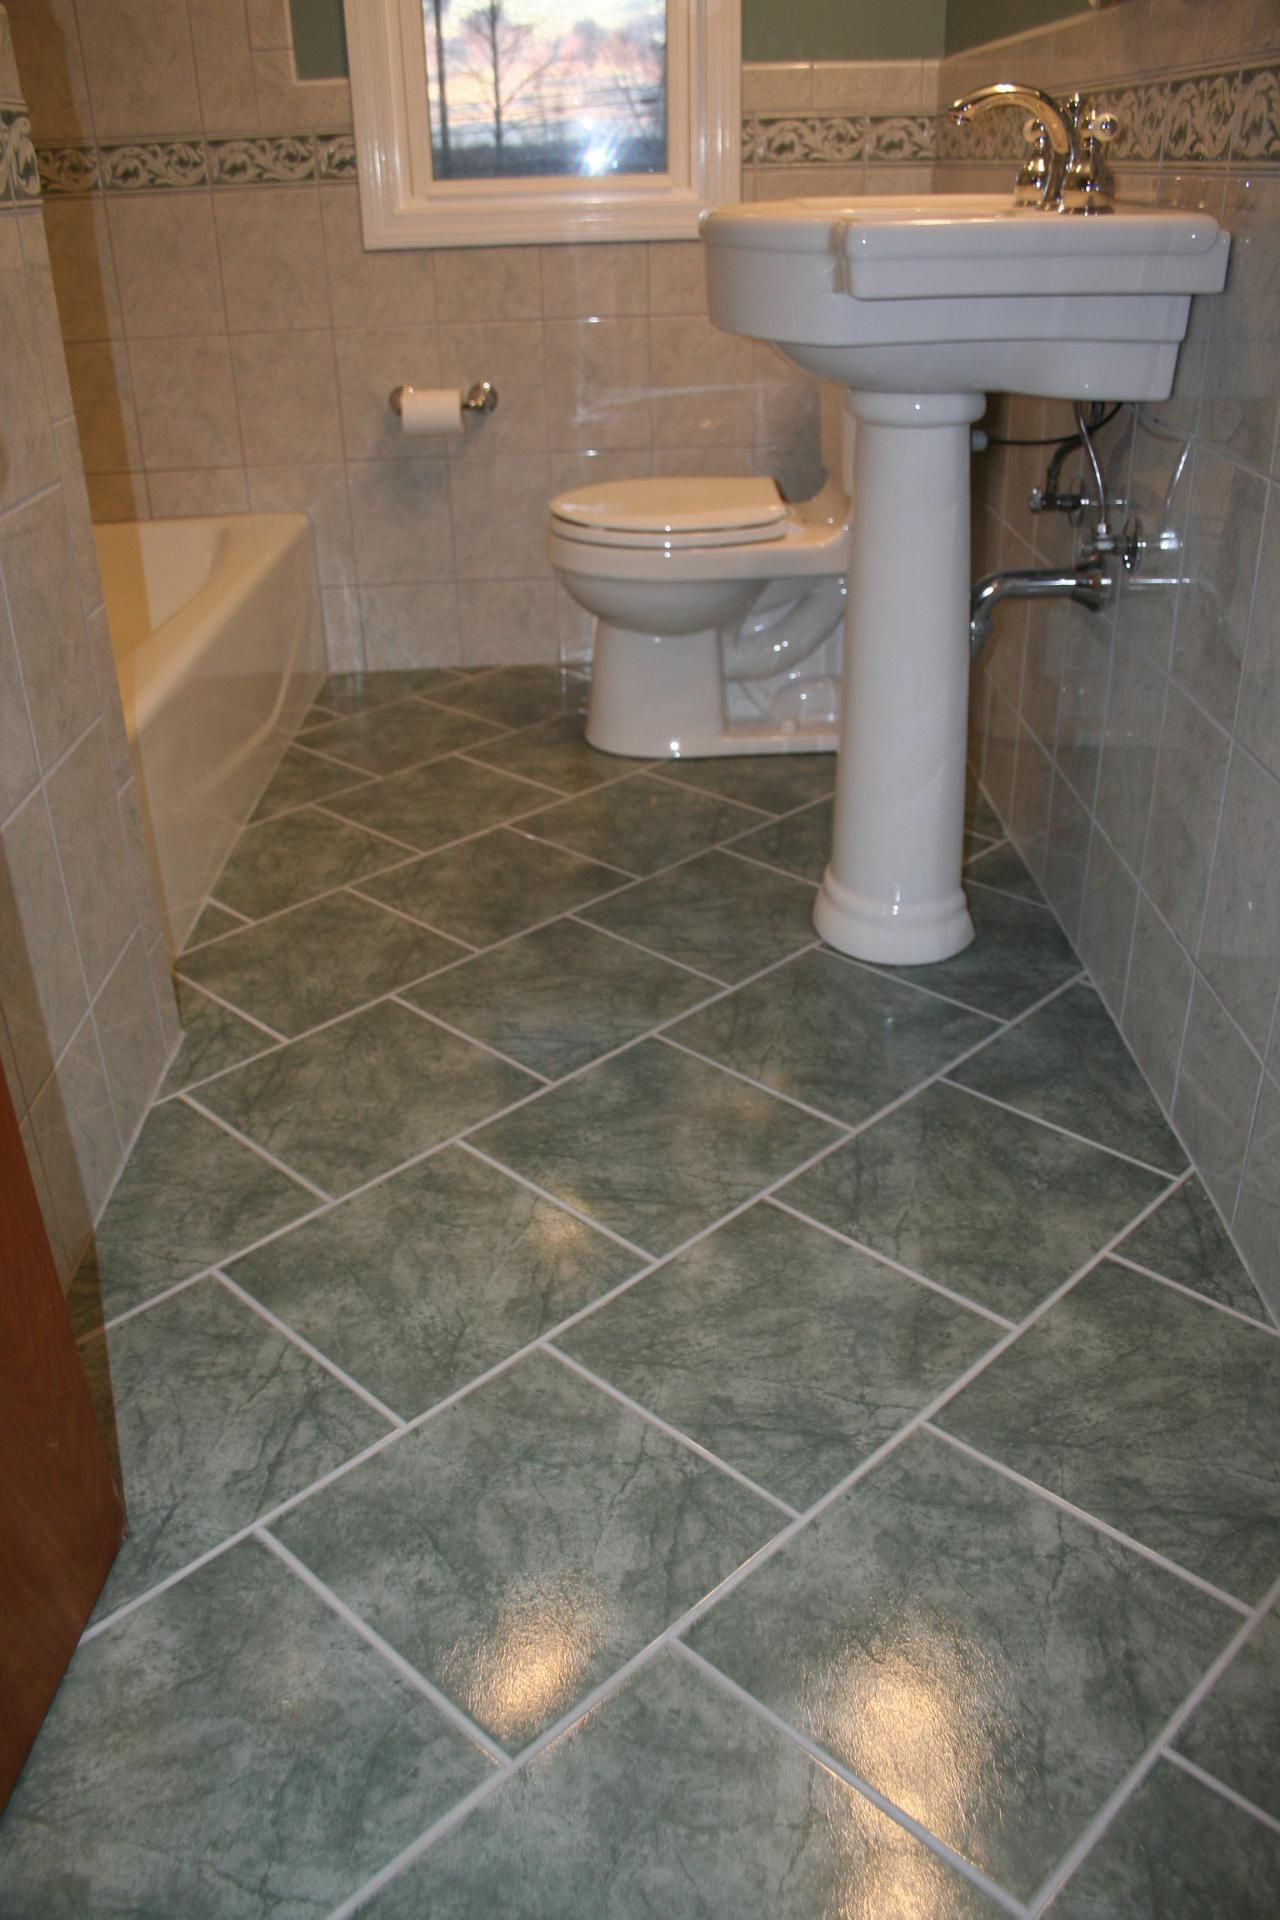 Tile Around Tub Google Search Tile Around Tub New Bathroom Ideas Bathrooms Remodel